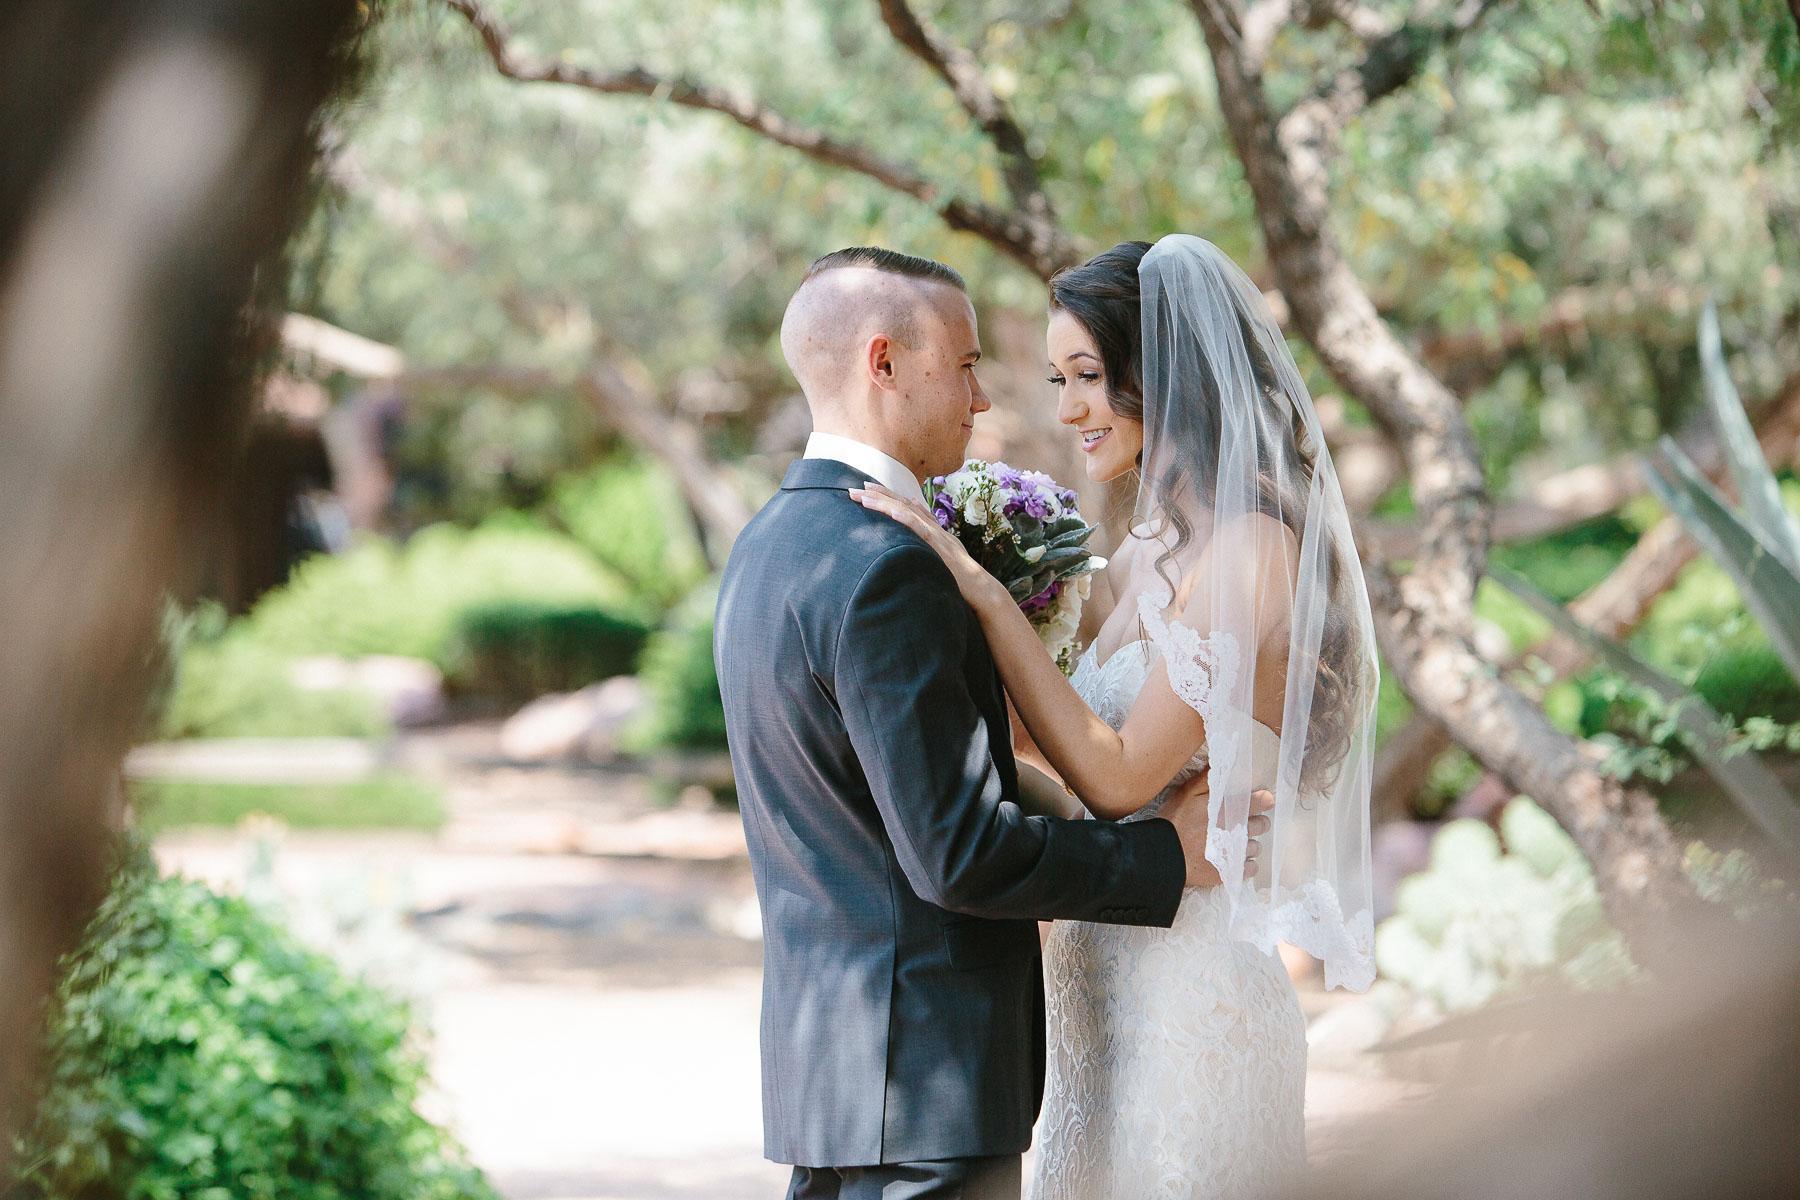 170528-Malkin-Wedding-Sedona-Arizona-Wedding-Photography-Sky-Ranch-Lodge-1008.jpg